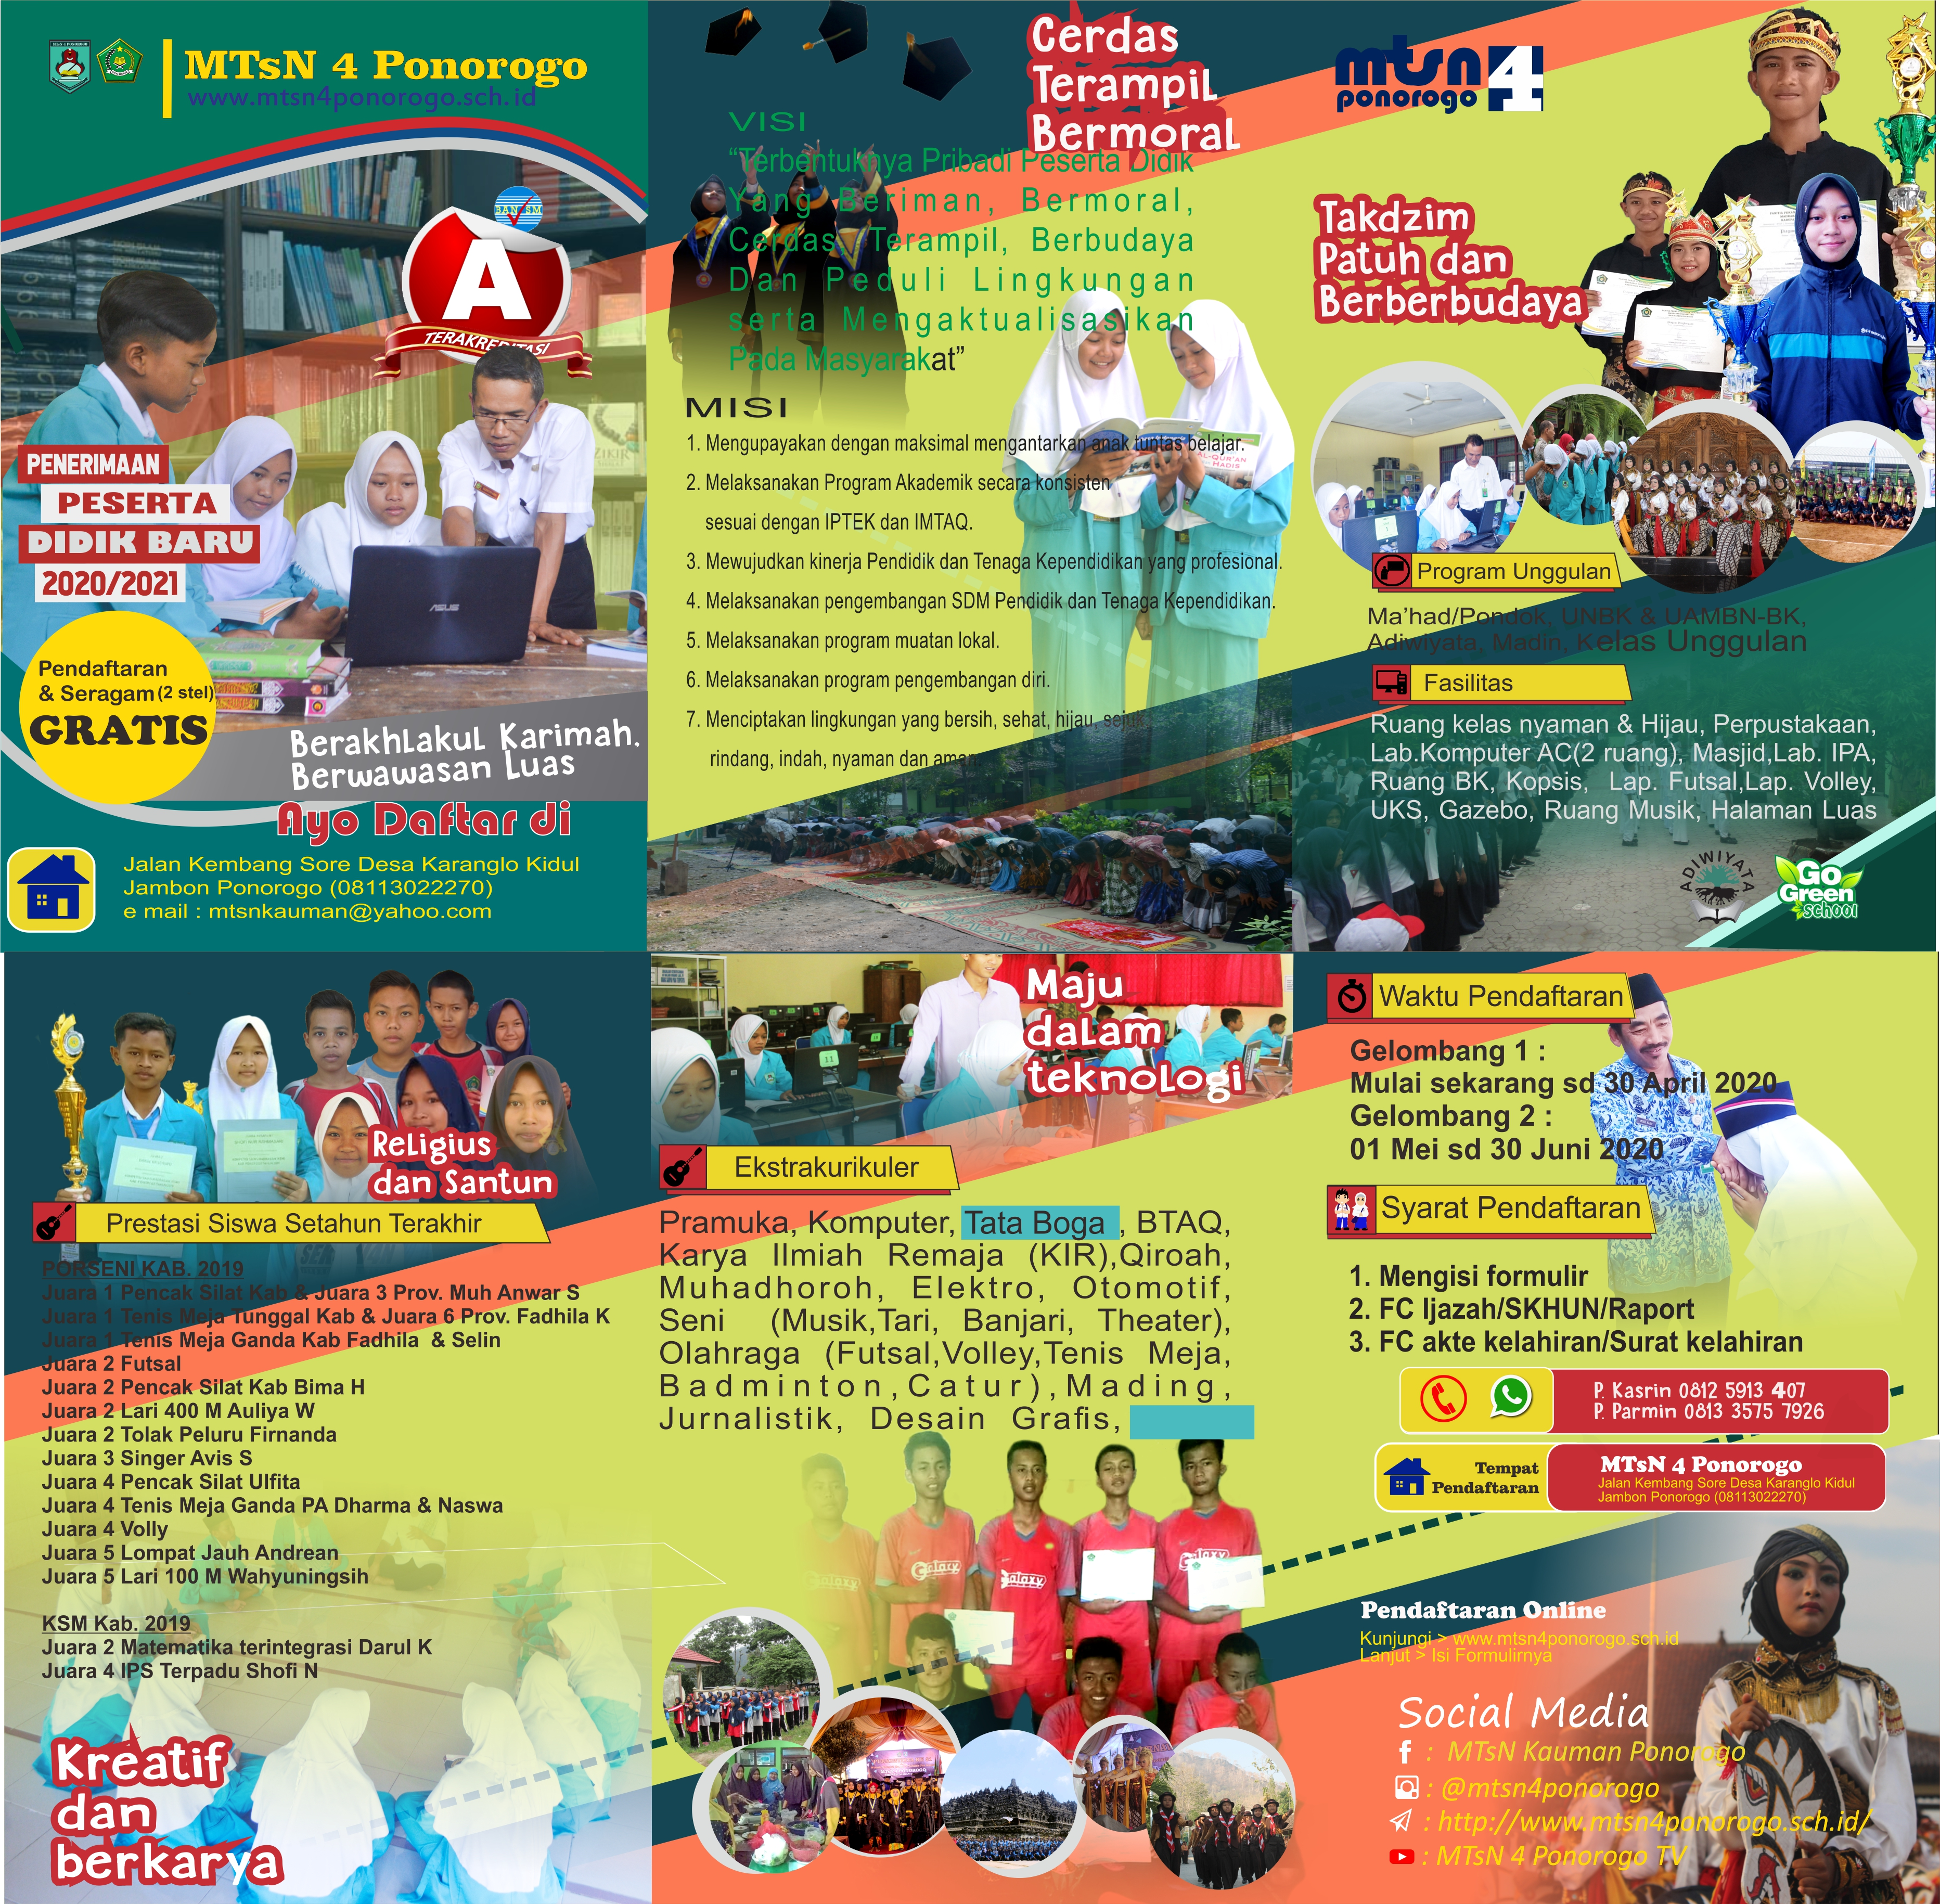 brosur PPDB MTsN 4 Ponorogo 2020